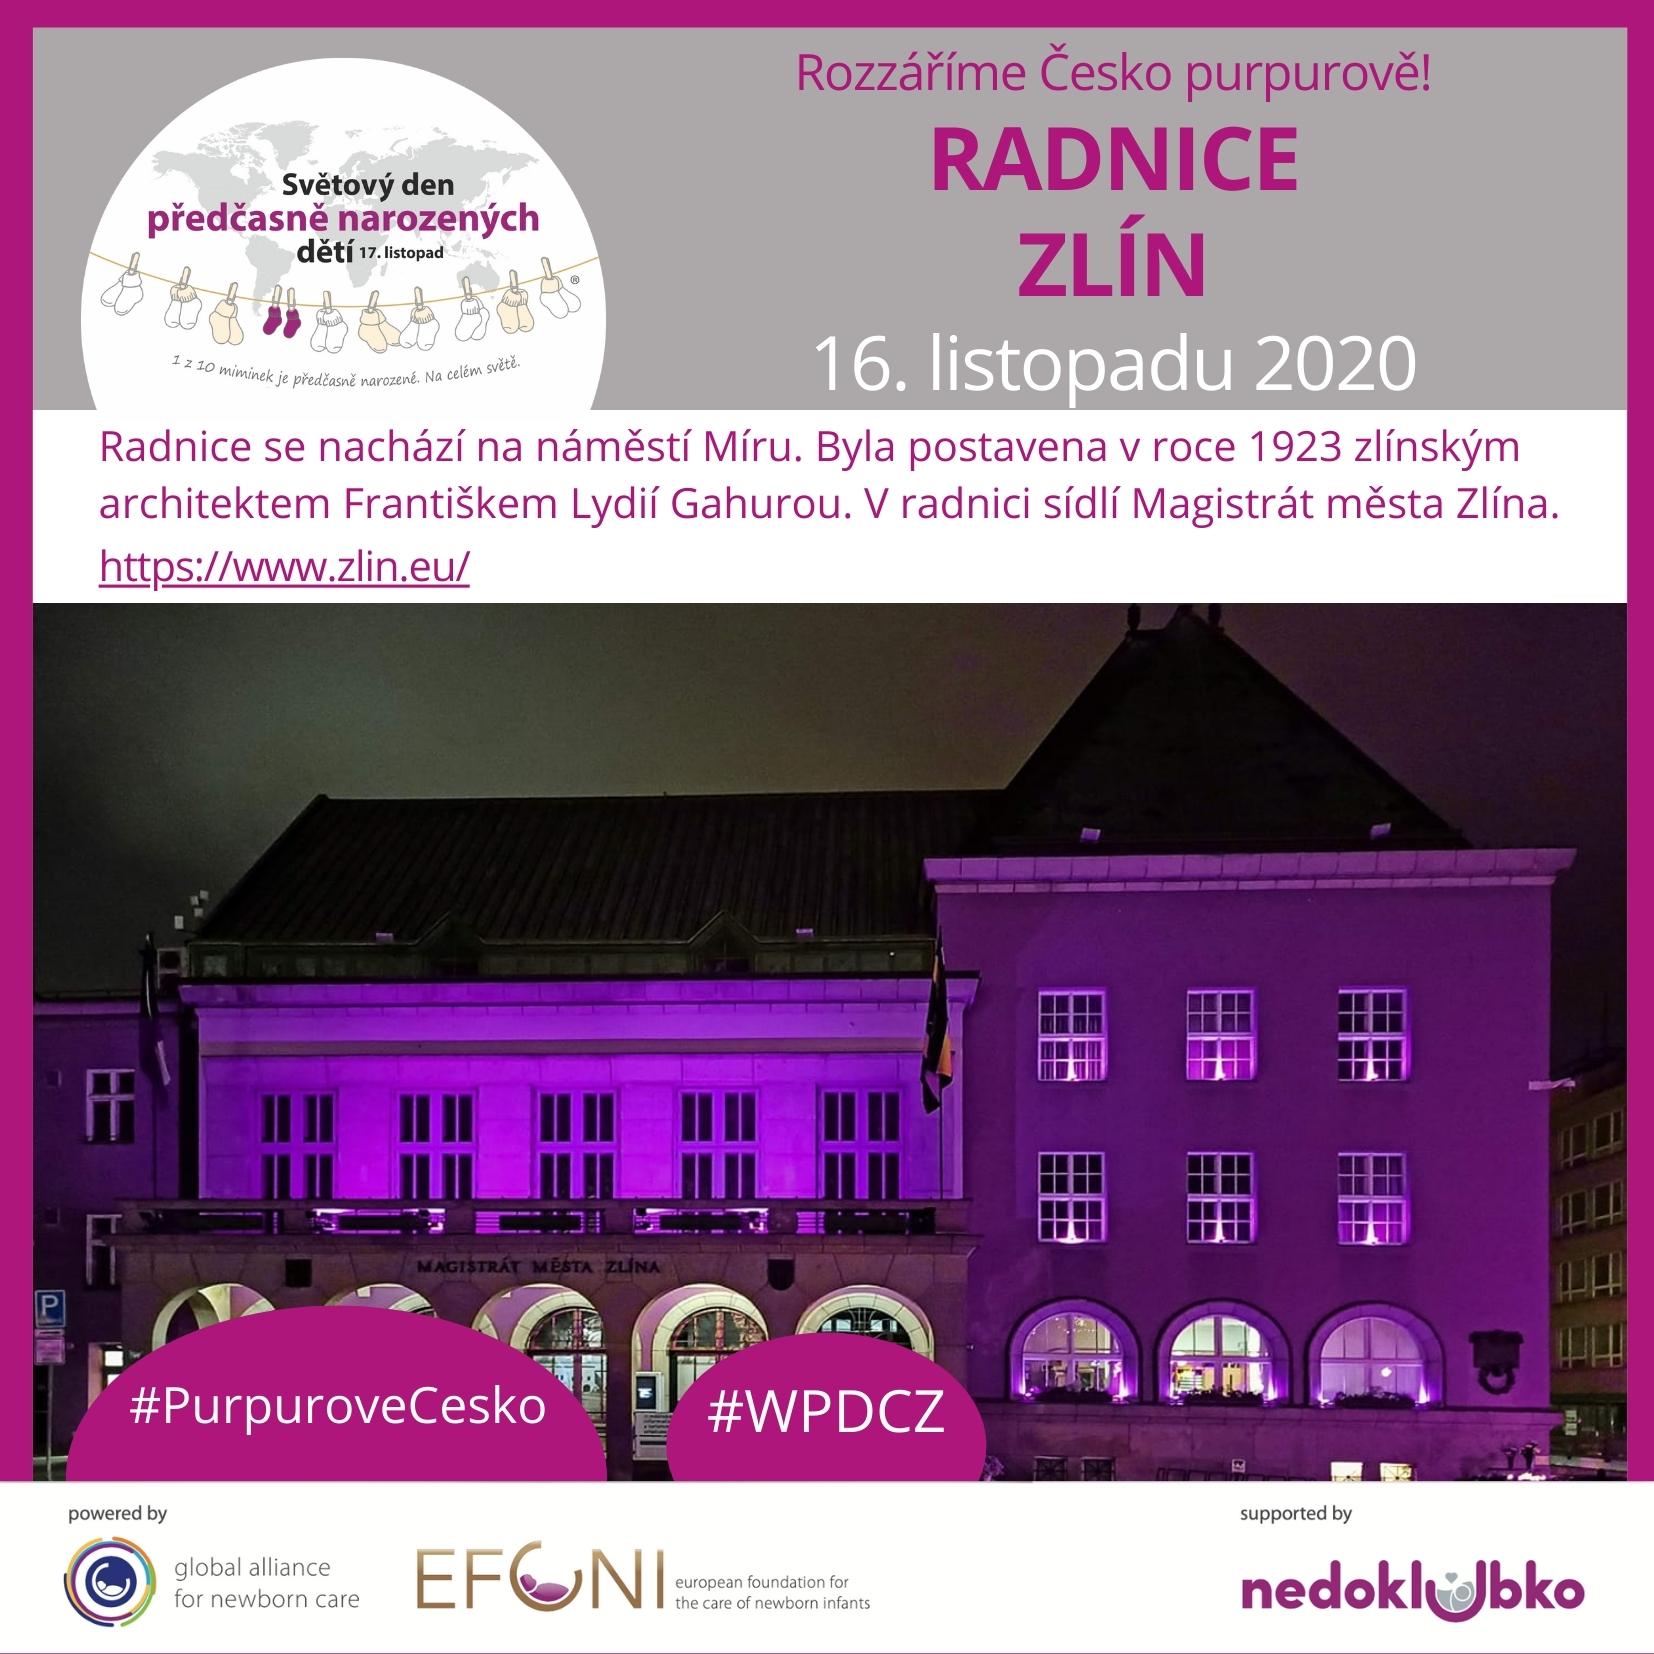 purpuroveCesko_RADNICE ZLIN (1)